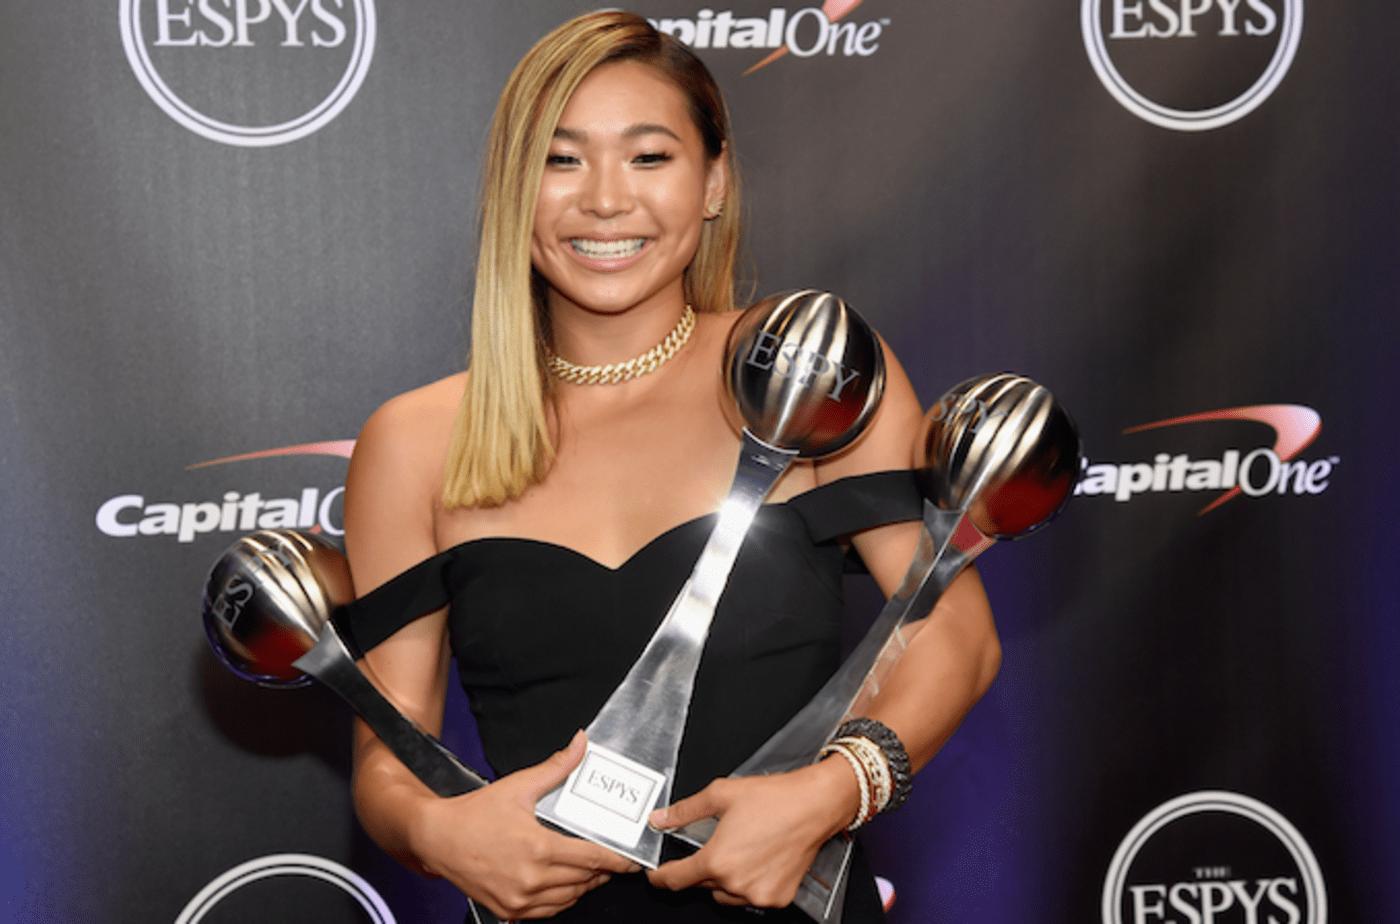 Chloe Kim at the 2018 ESPYs.